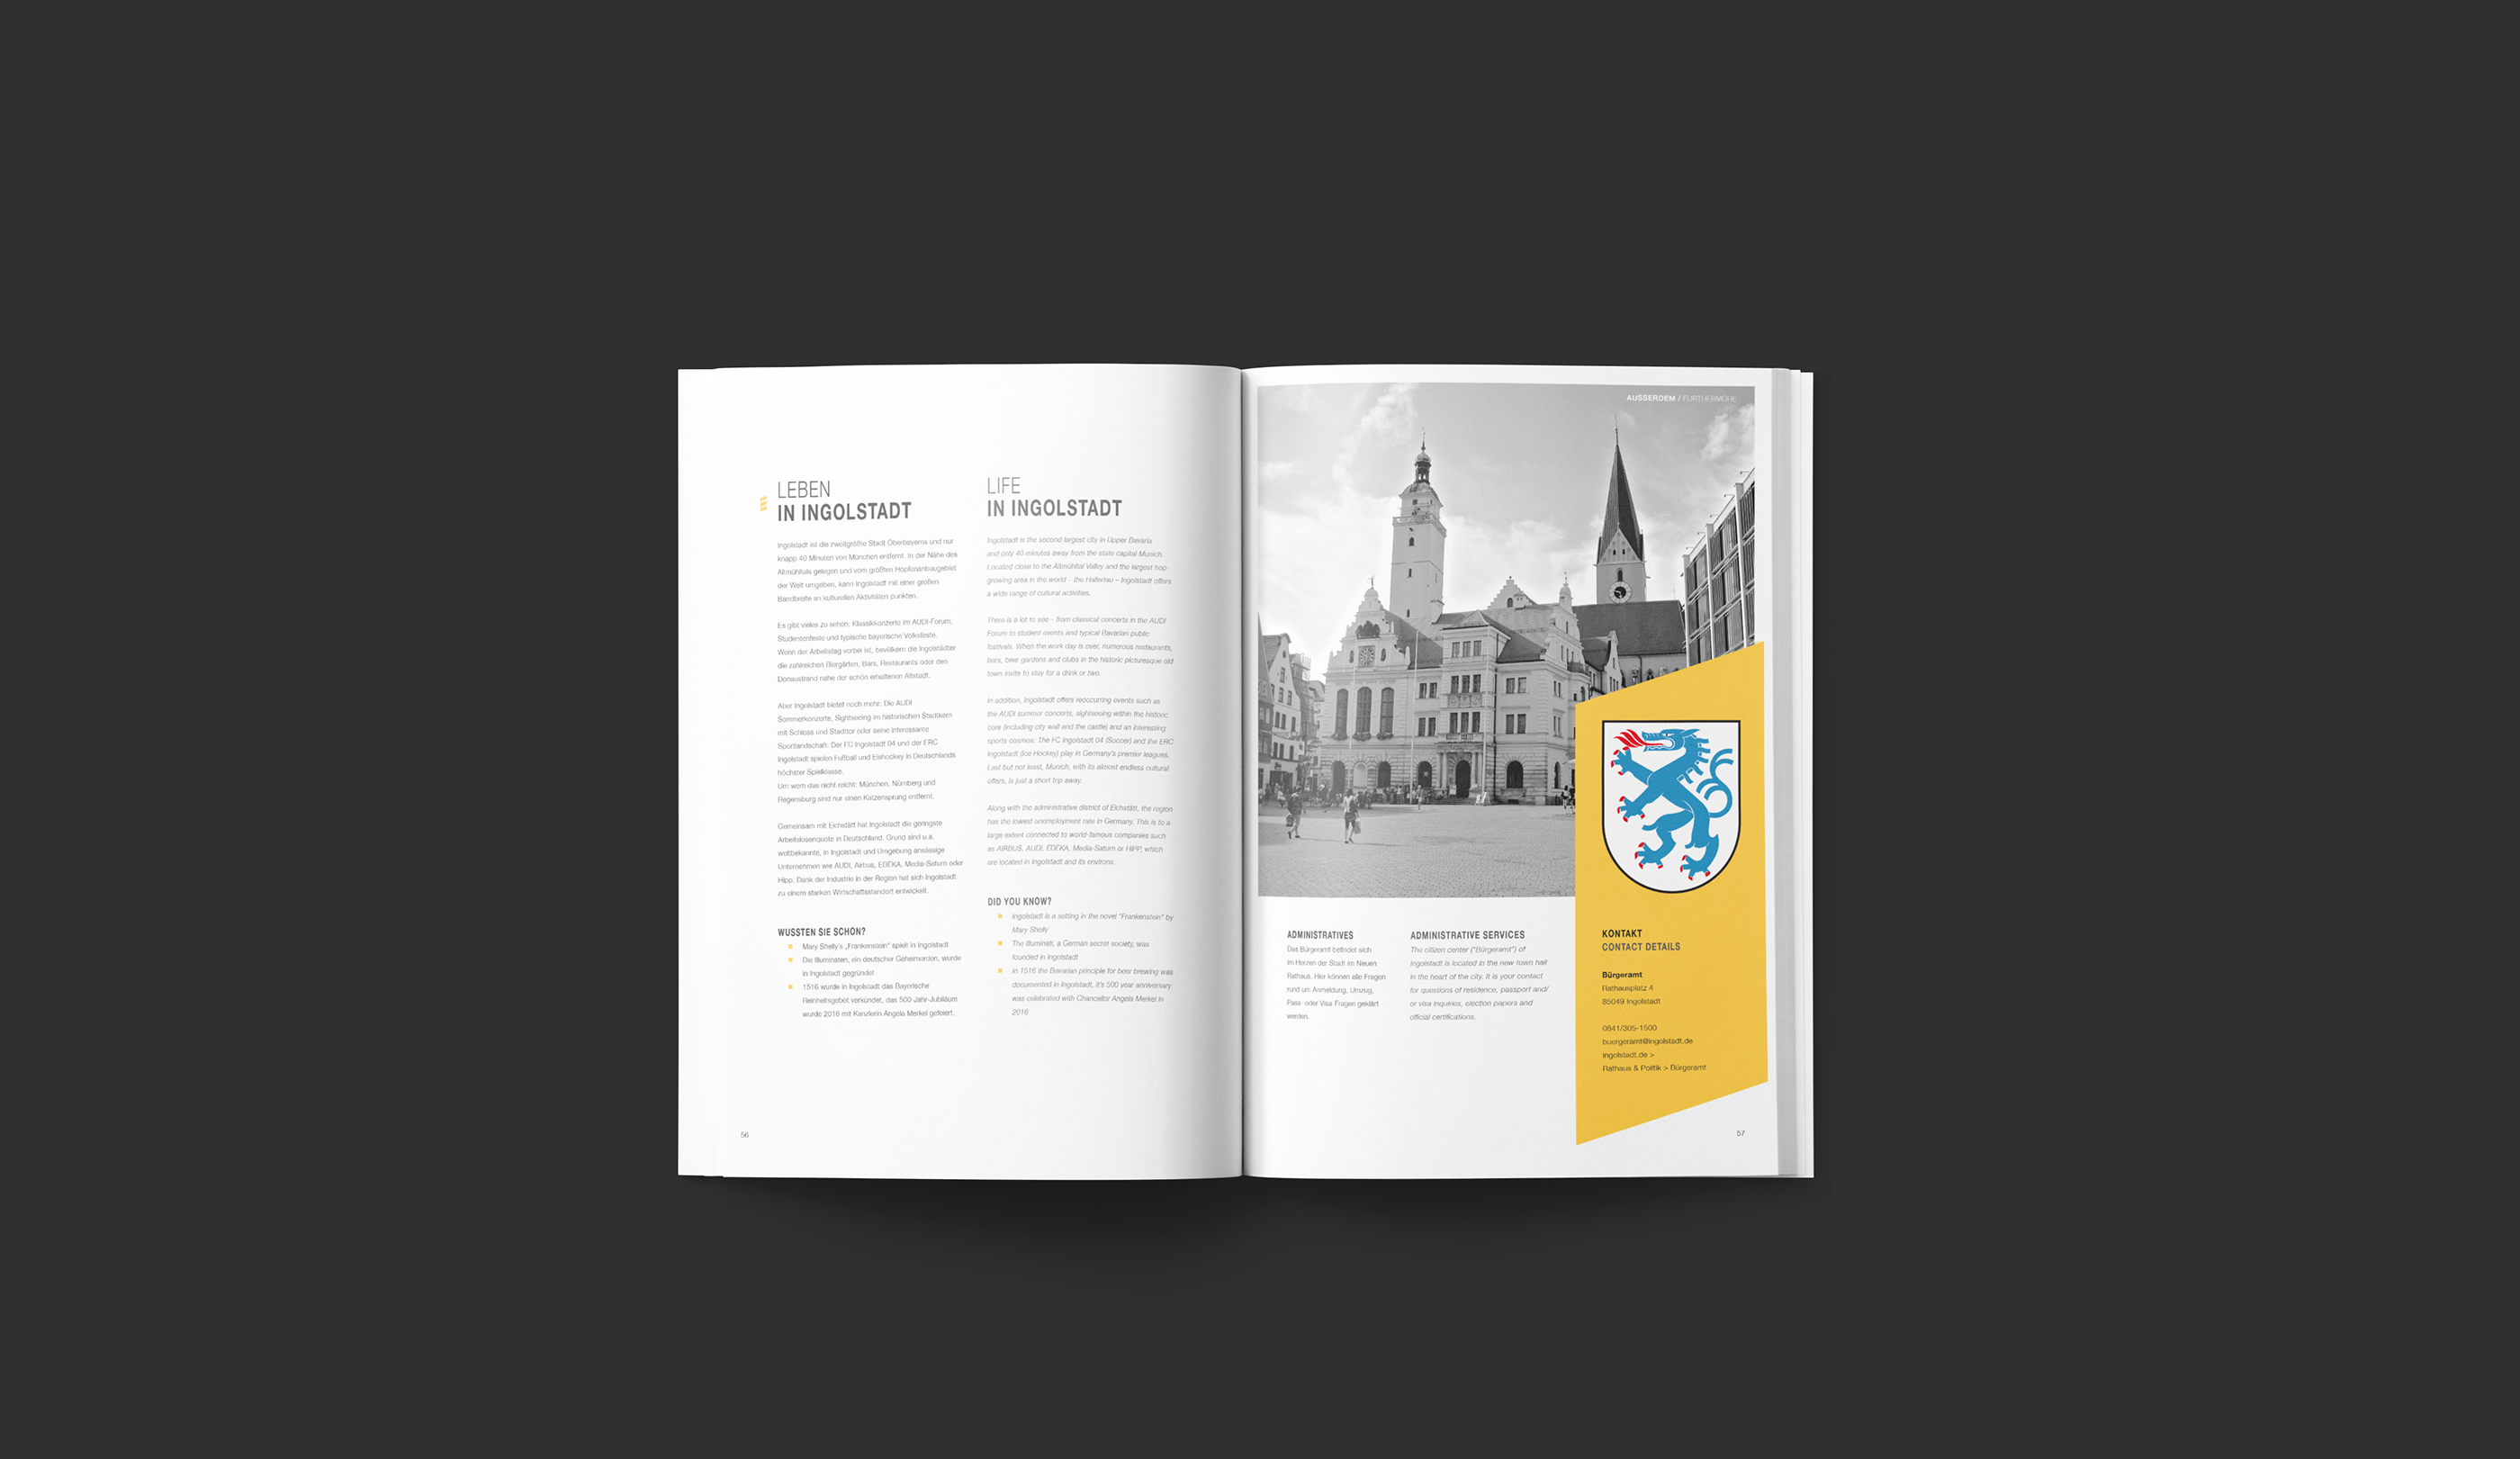 WFI Ingolstadt Handbuch | Editorial Design on Behance